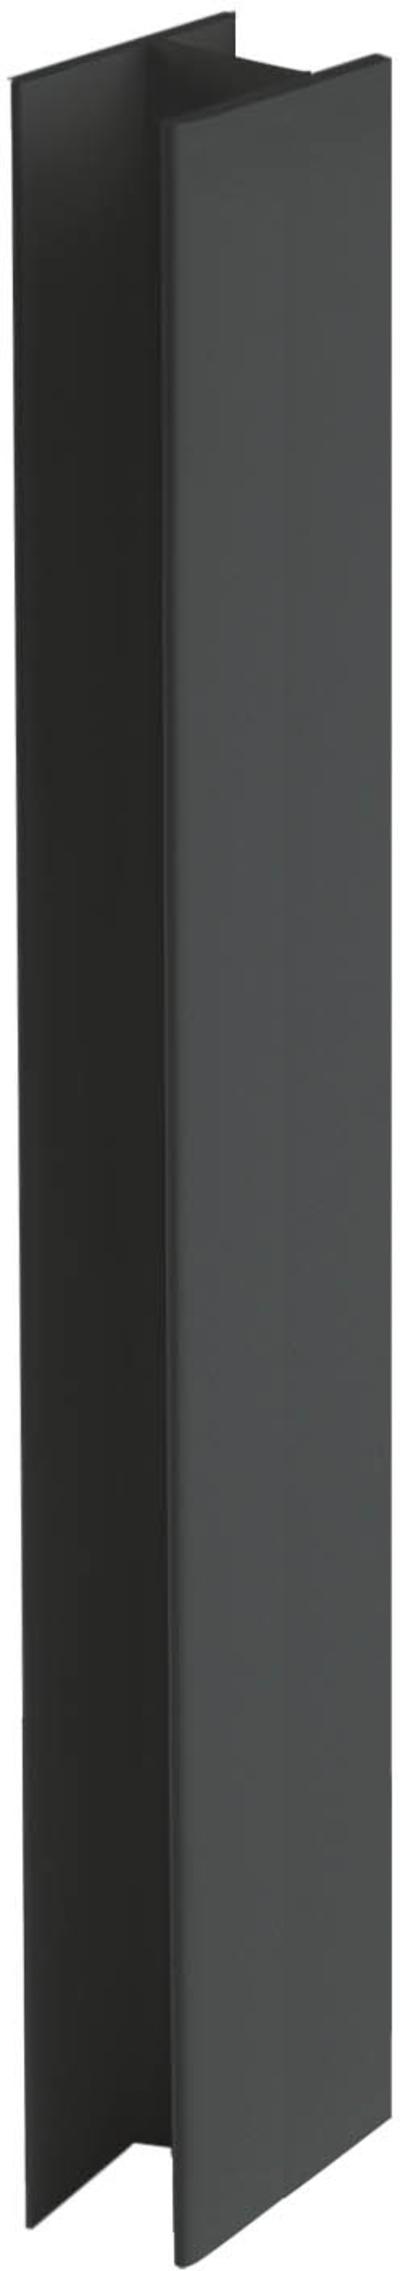 COK TS 150mm TH-15T Cokola elements